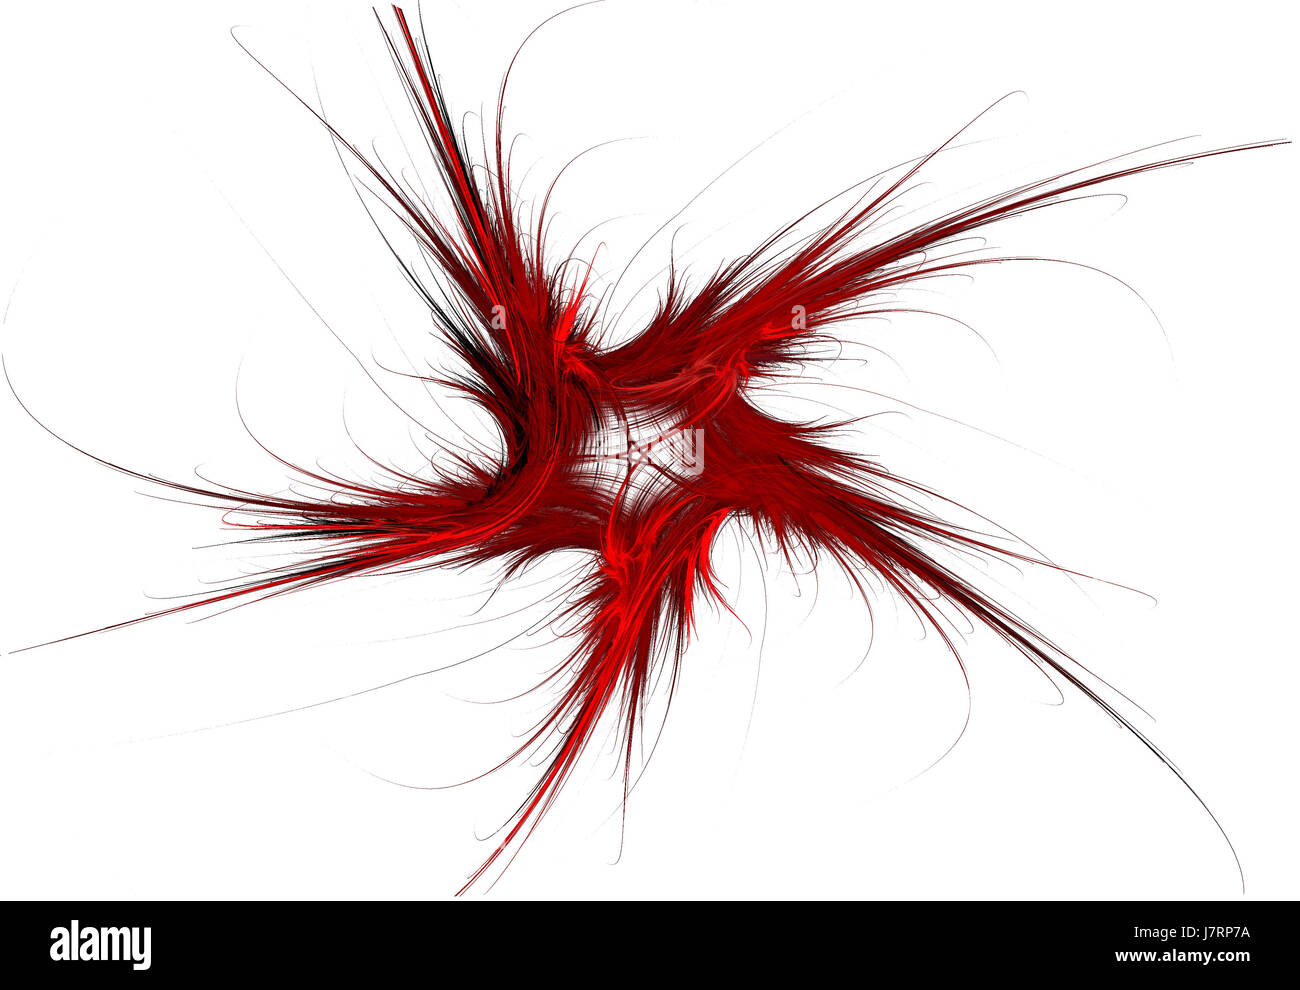 graphic fractal patriotic conspicuous pictographic transparent computers - Stock Image